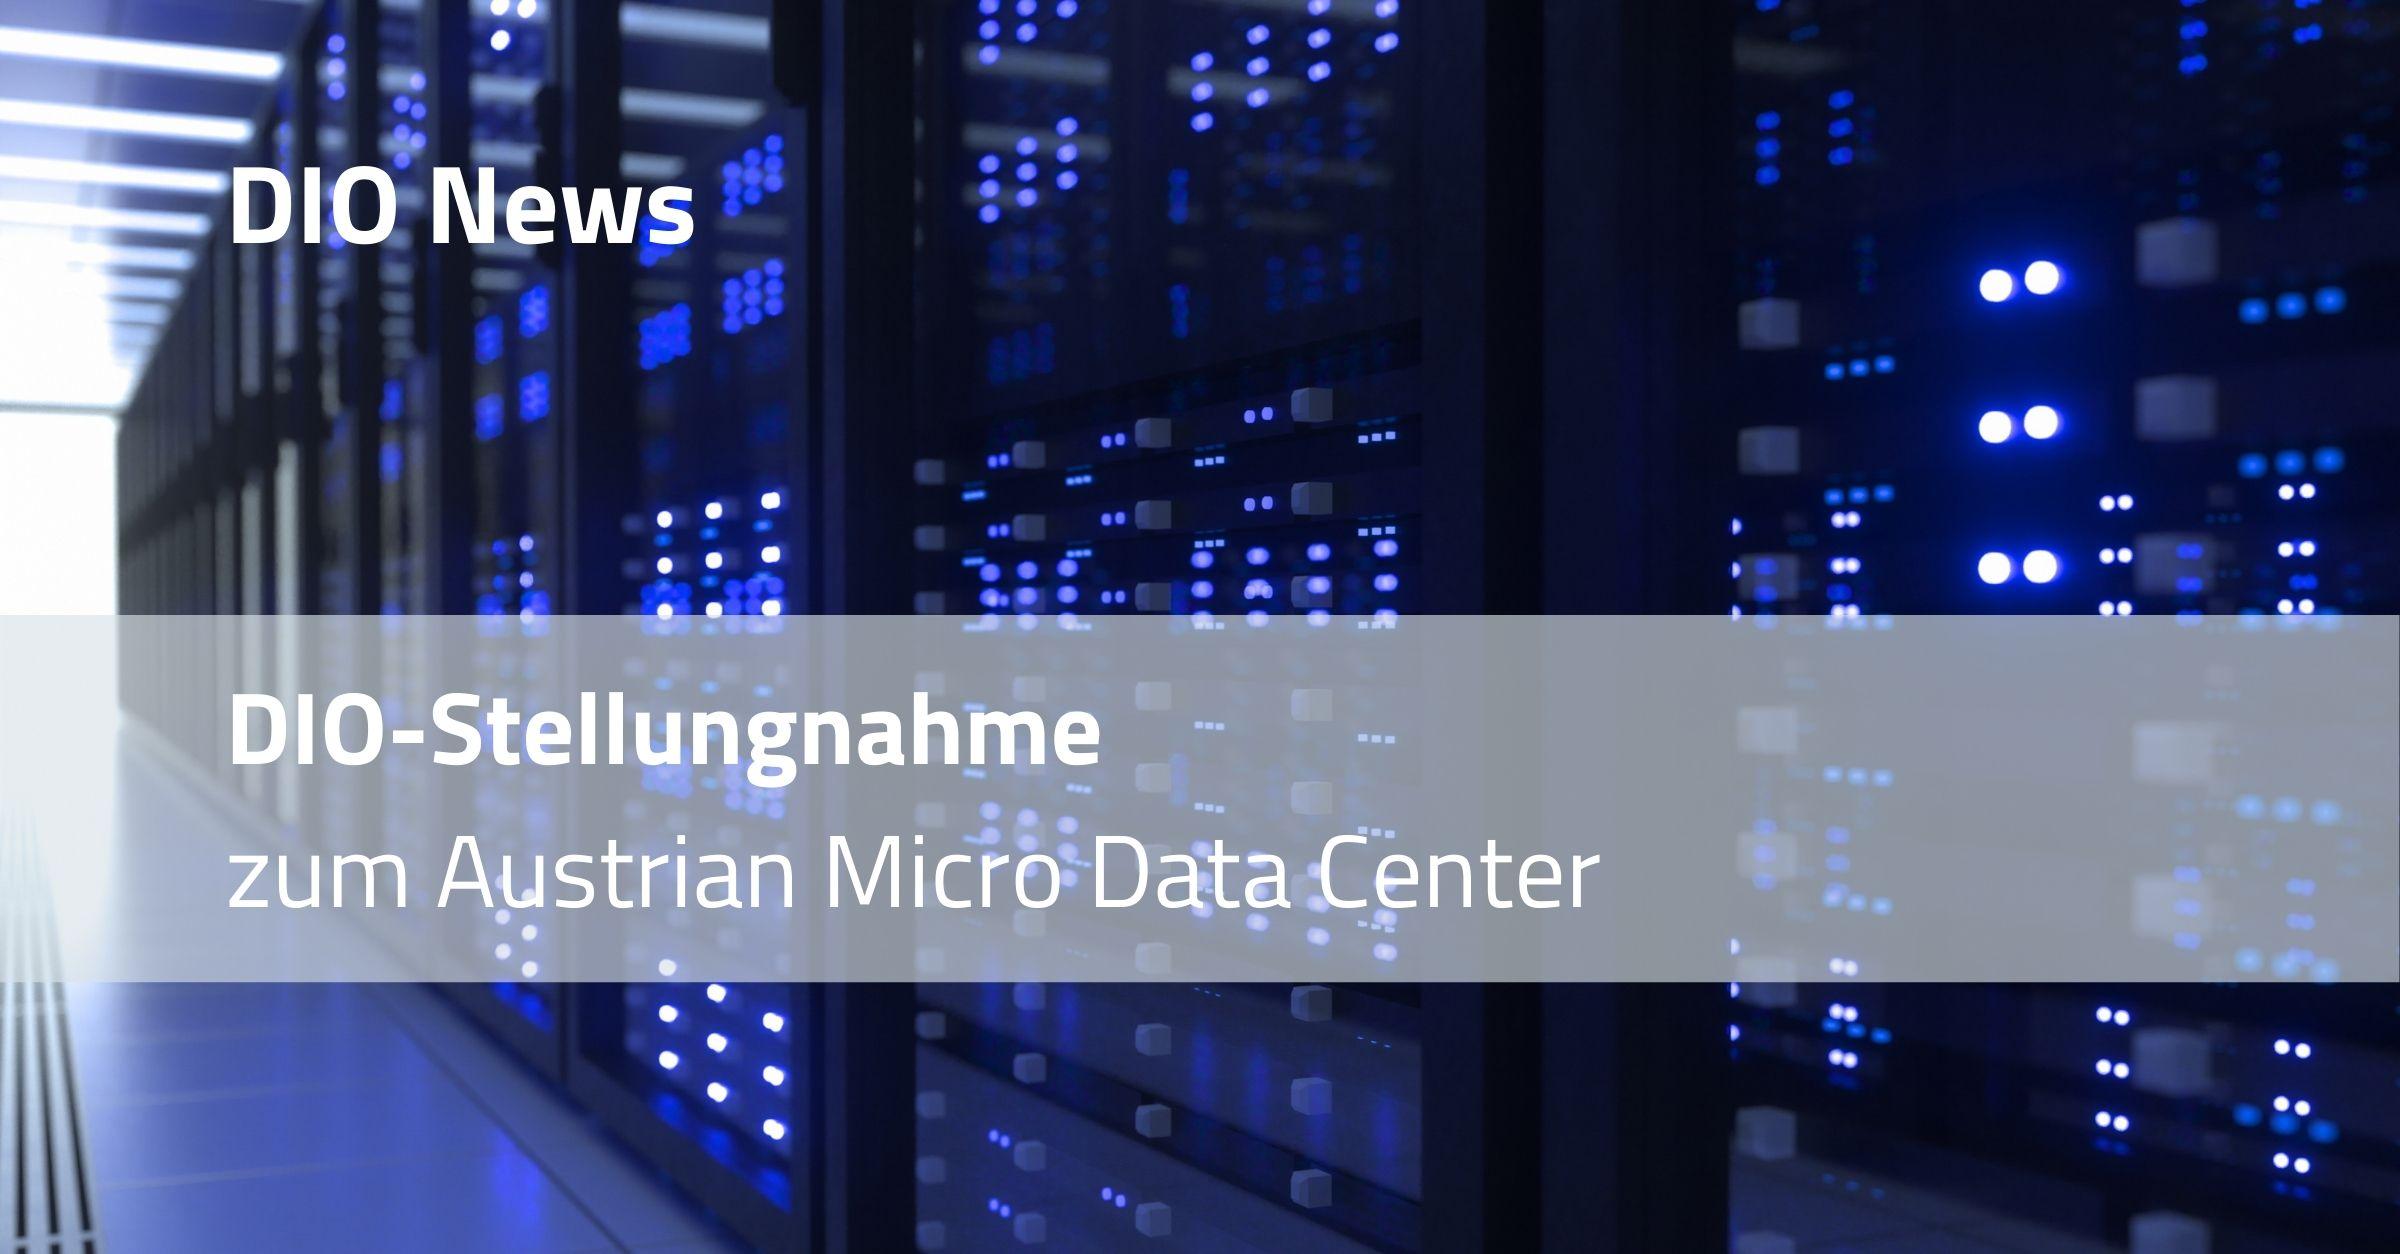 DIO-Stellungnahme zum Austrian Micro Data Center